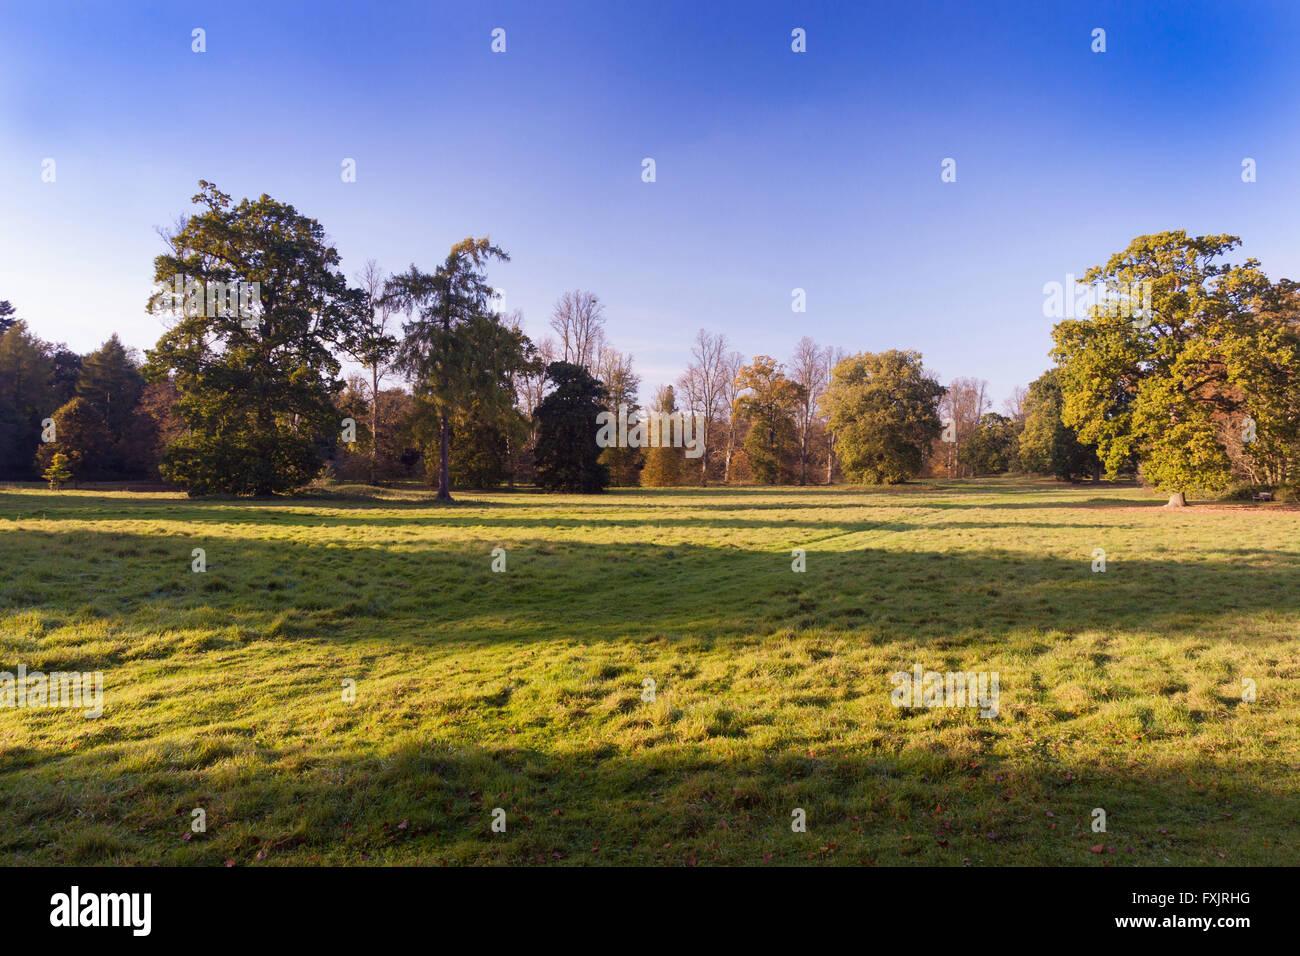 Nowton Park near Bury St Edmunds, Suffolk, UK - Stock Image